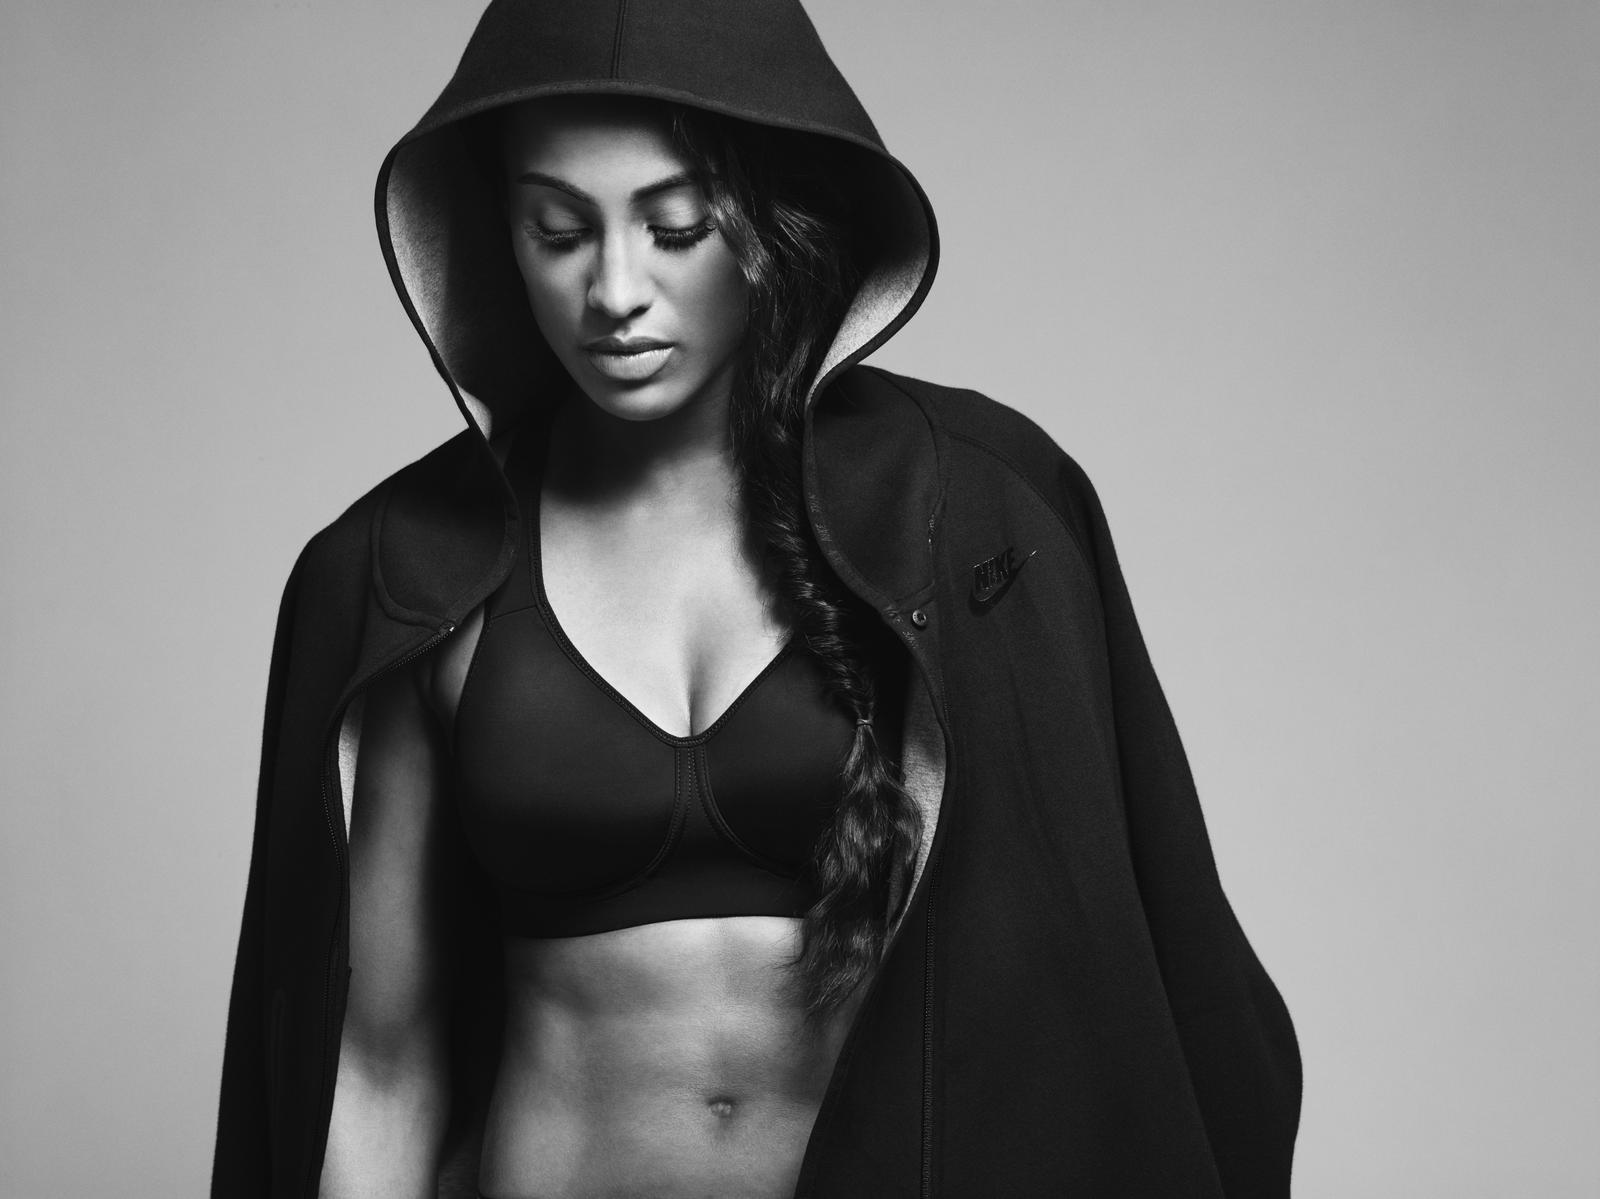 Skylar_Diggins_Nike_4